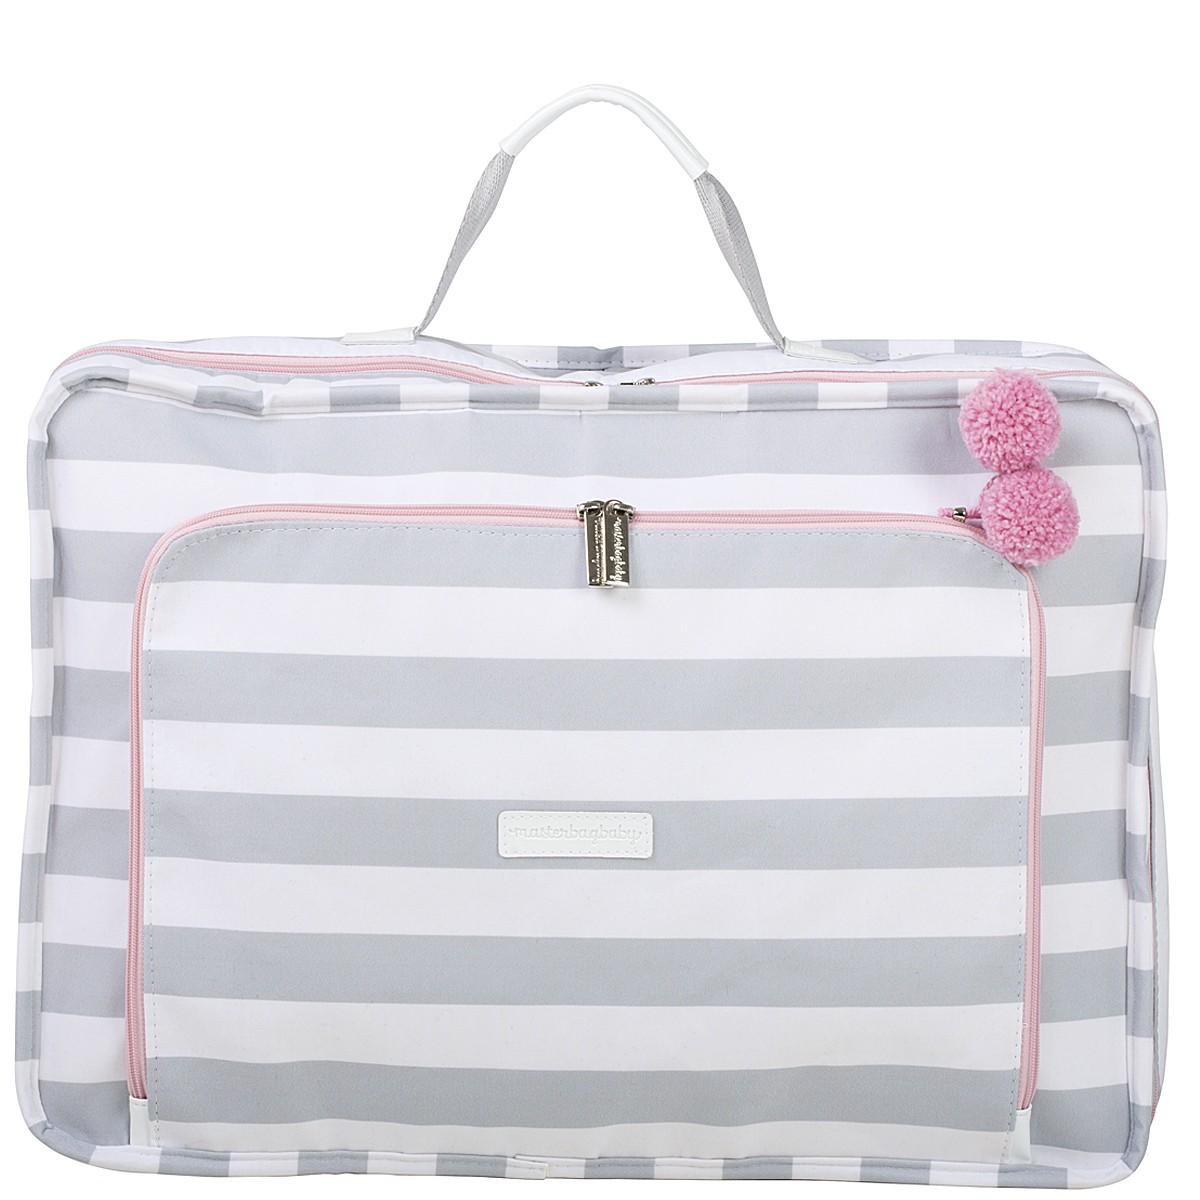 Mala Maternidade Masterbag Vintage Candy Colors Ice Pink